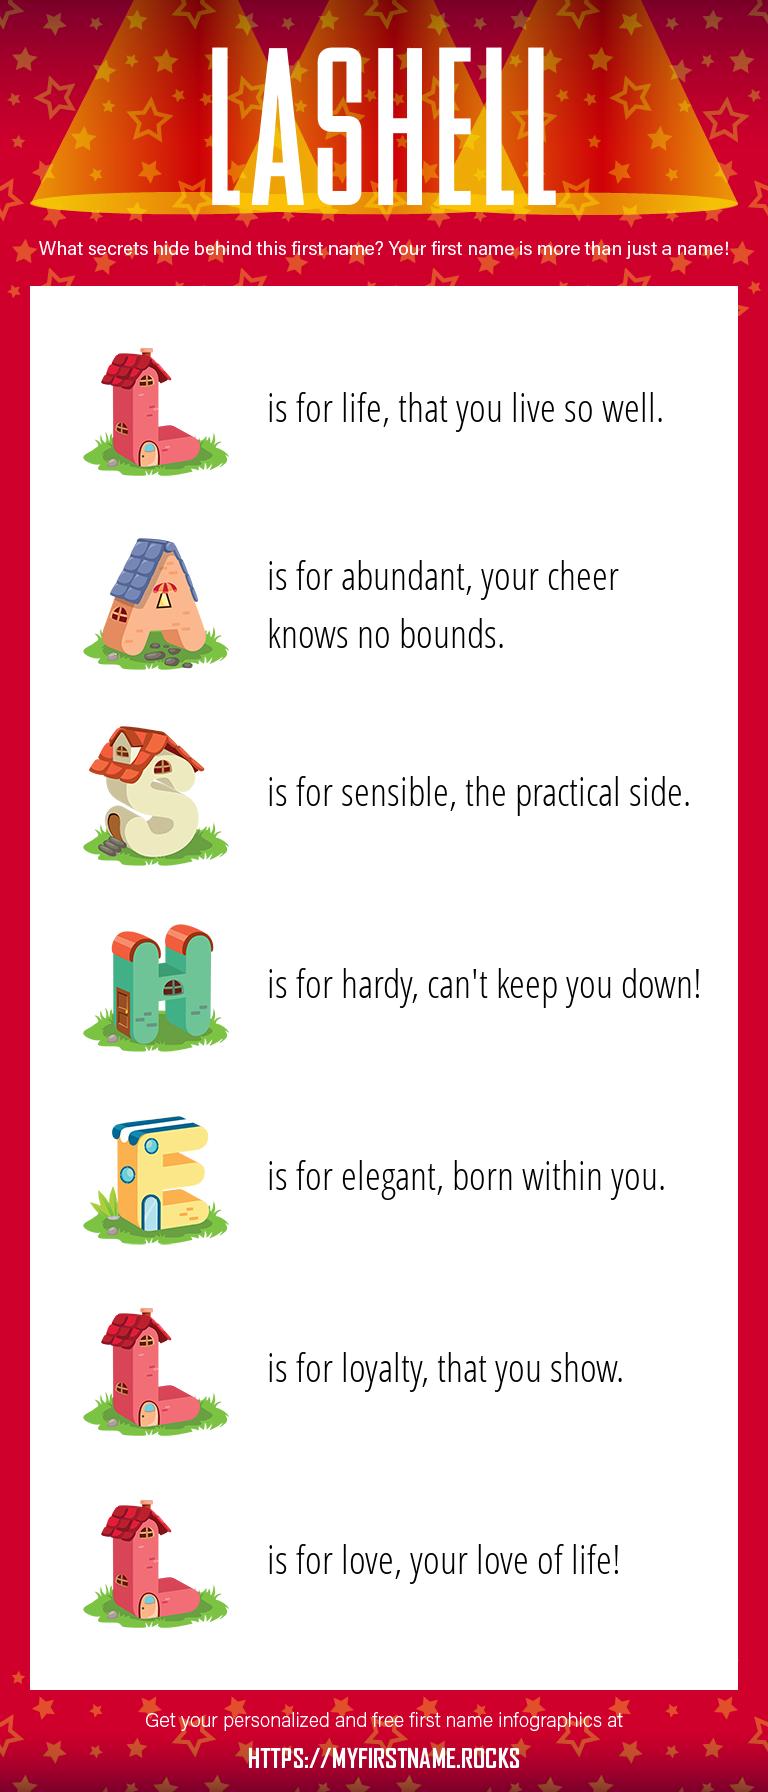 Lashell Infographics